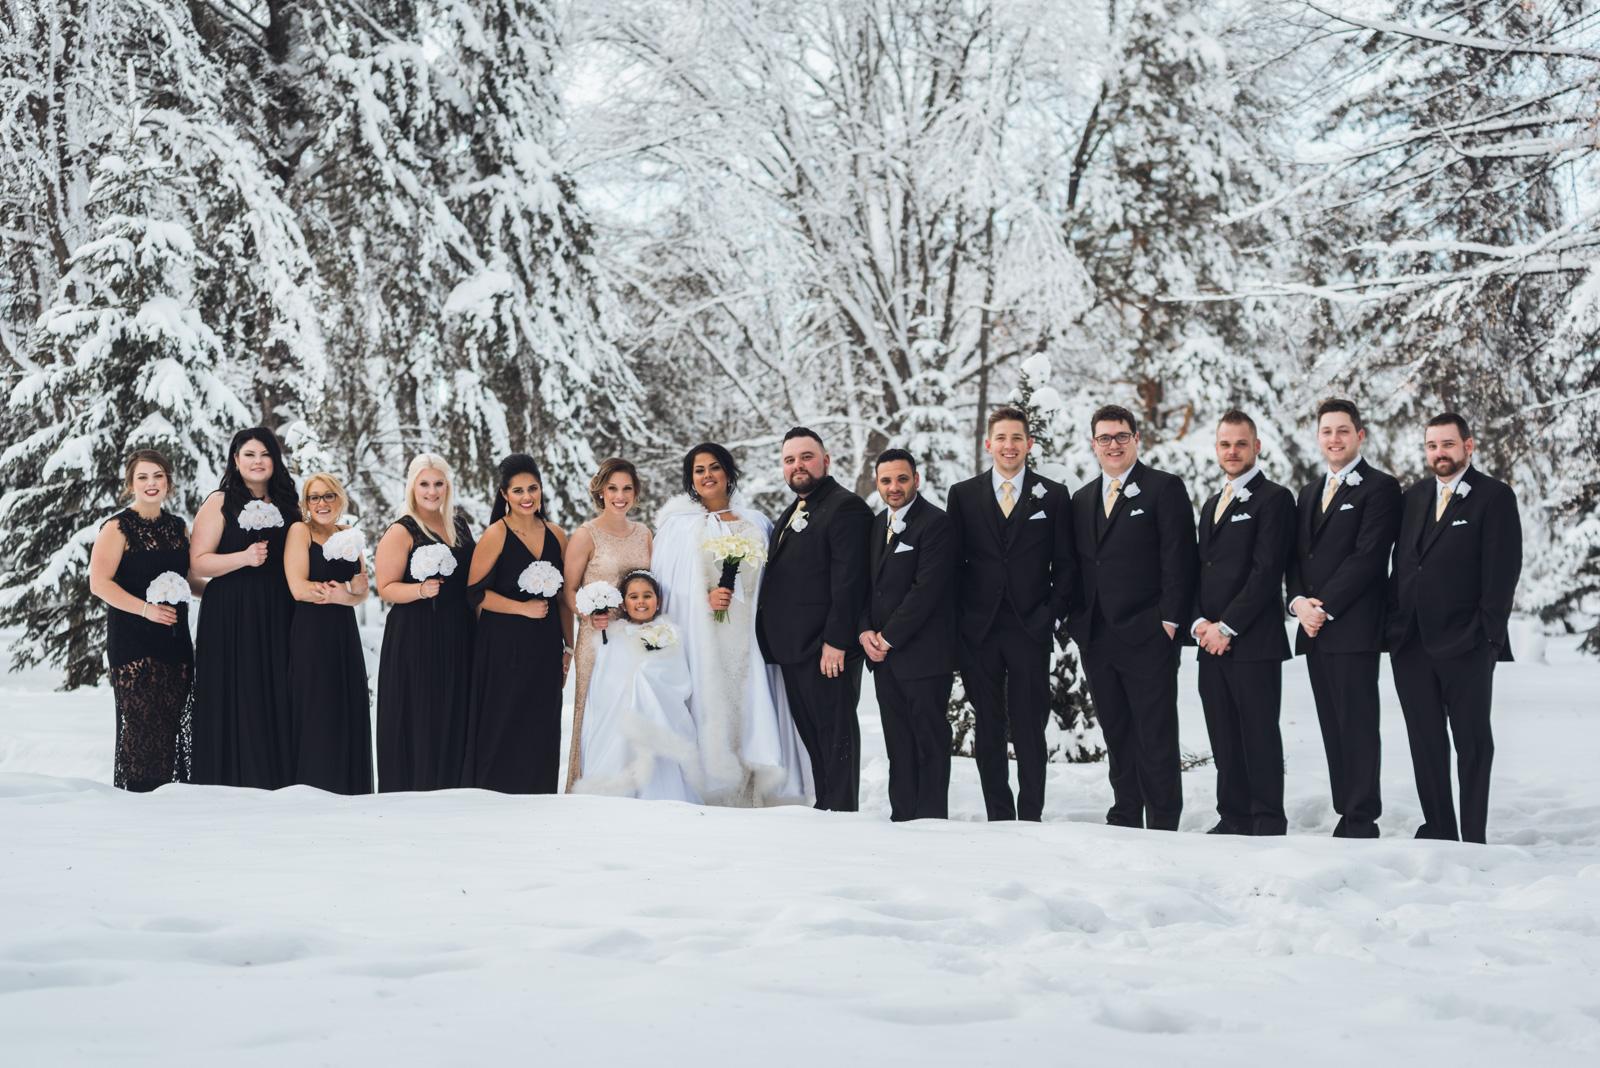 rheana-chris-wedding-blog-161.jpg